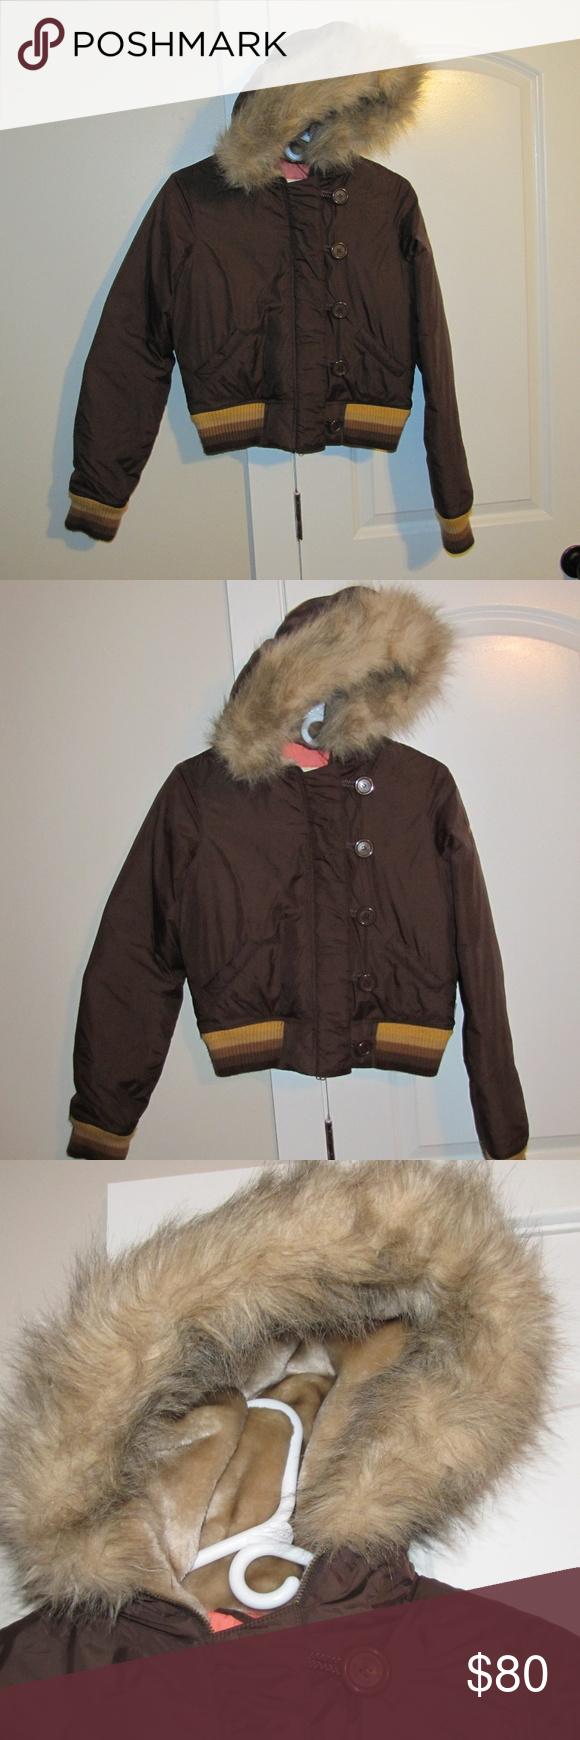 Hollister Women's Hooded Jacket Vintage Sz.LFUR